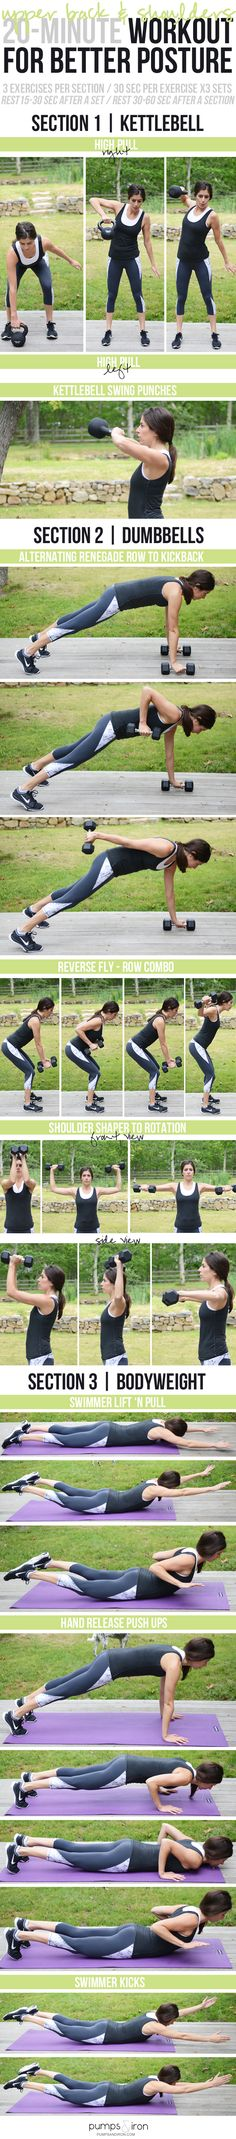 20-Minute Workout for Better Posture (targets upper back and shoulders)